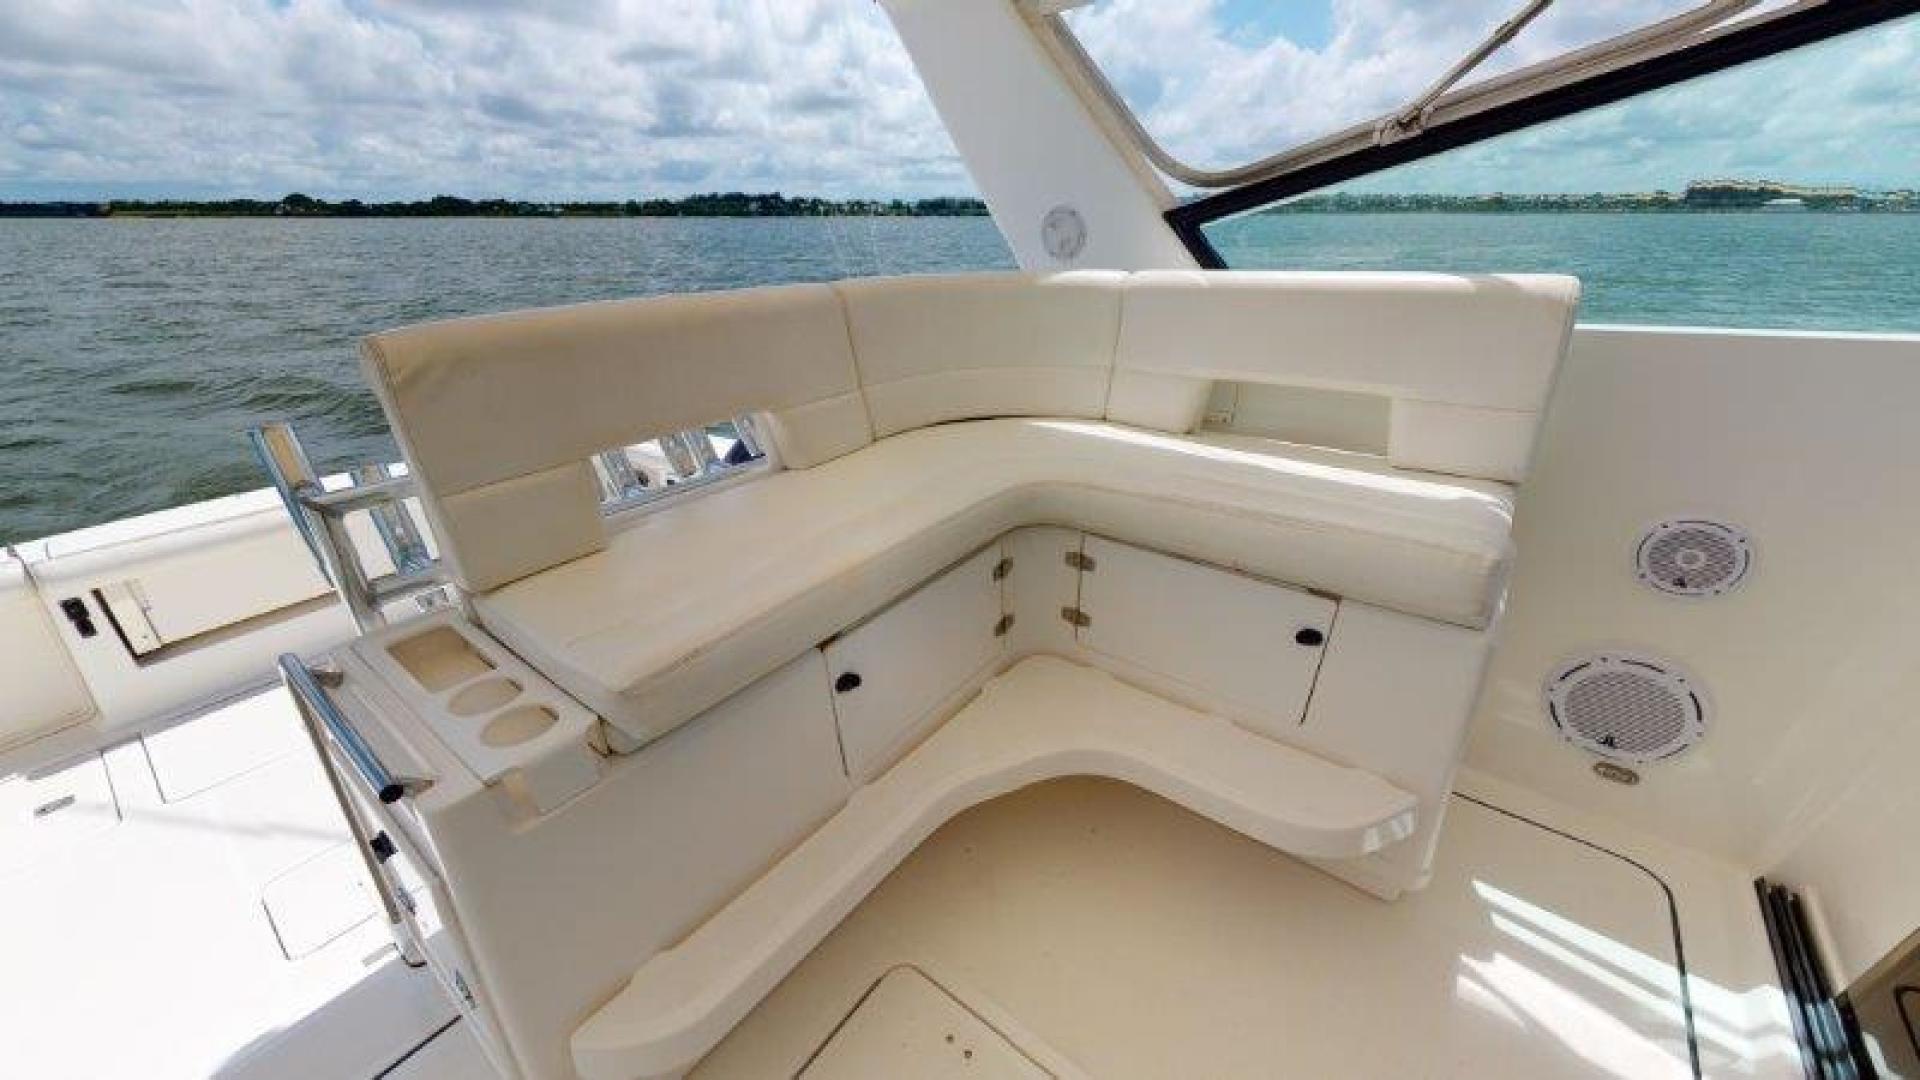 Tiara Yachts-4100 Open 2000-Sans Peur Stuart-Florida-United States-Helm Deck Seating-1464322 | Thumbnail